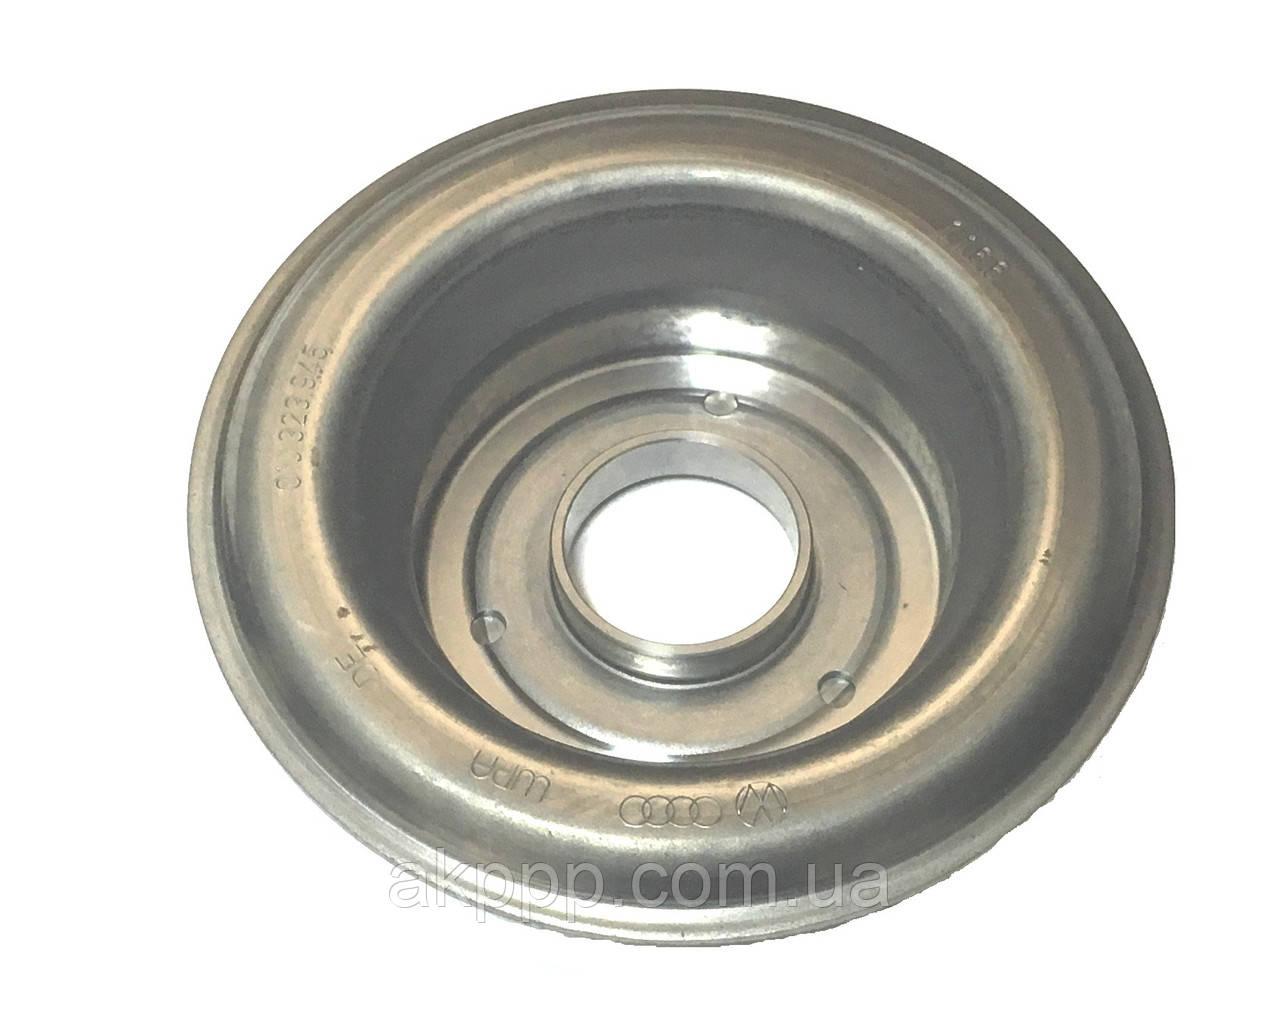 Железо акпп 01J, 0AW, CVT